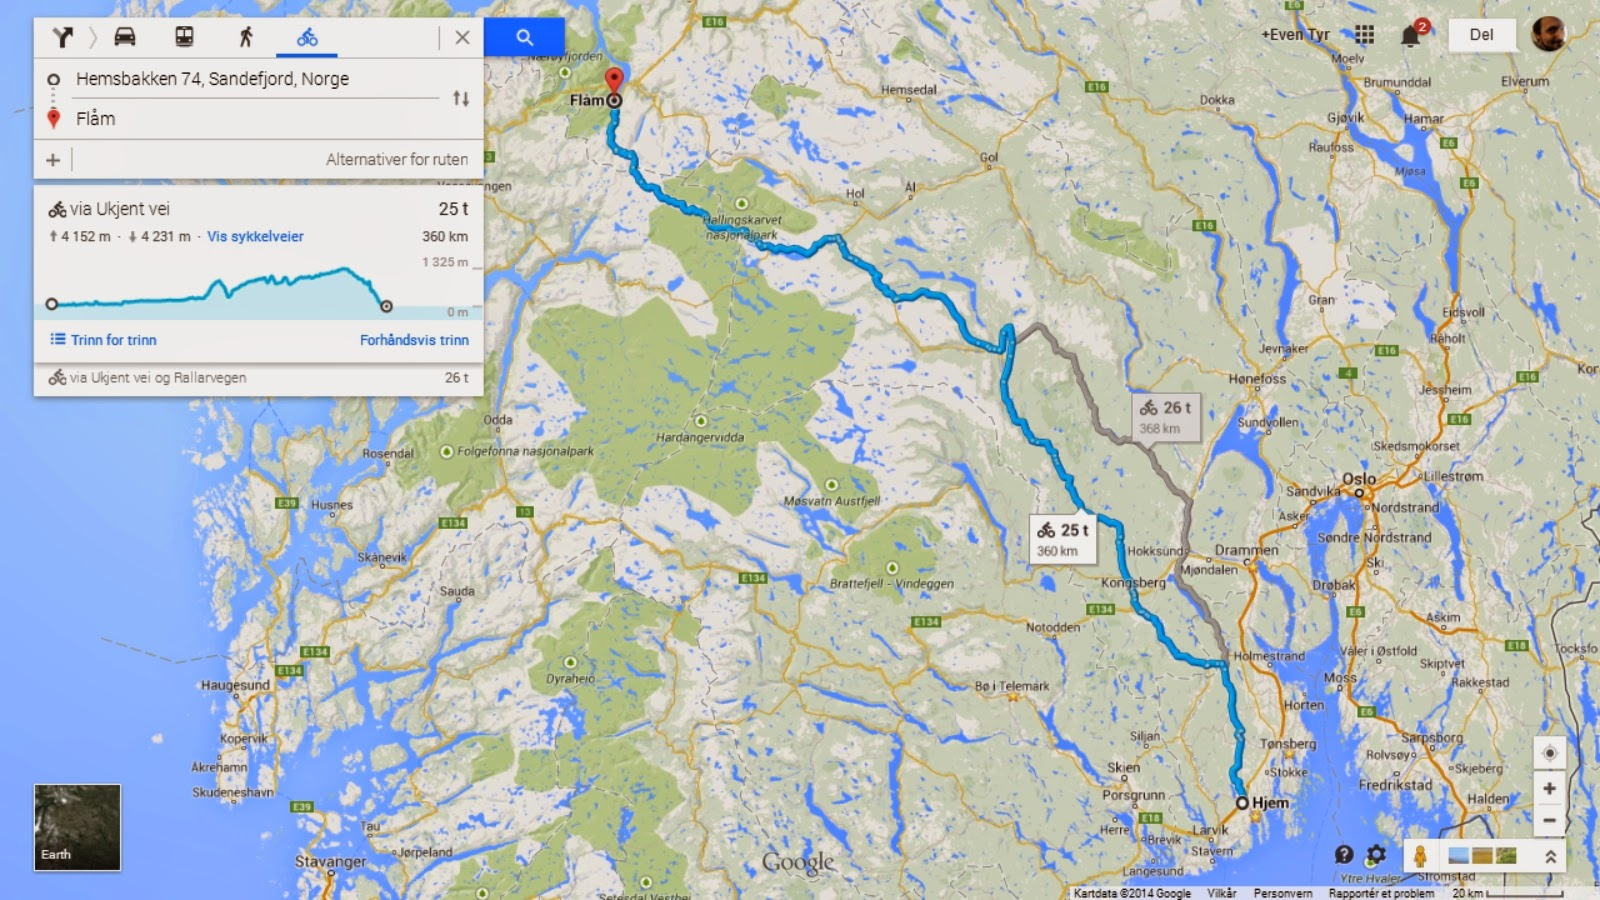 Bjerkisene Pa Tur Sandefjord Flam Bergen Ide Plan Og Forklaring